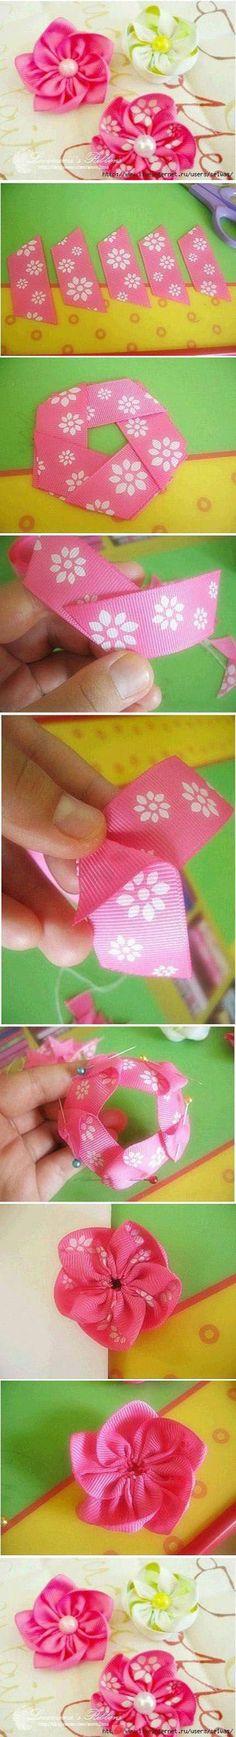 Diy Beautiful Pink Flower | DIY  Crafts Tutorials